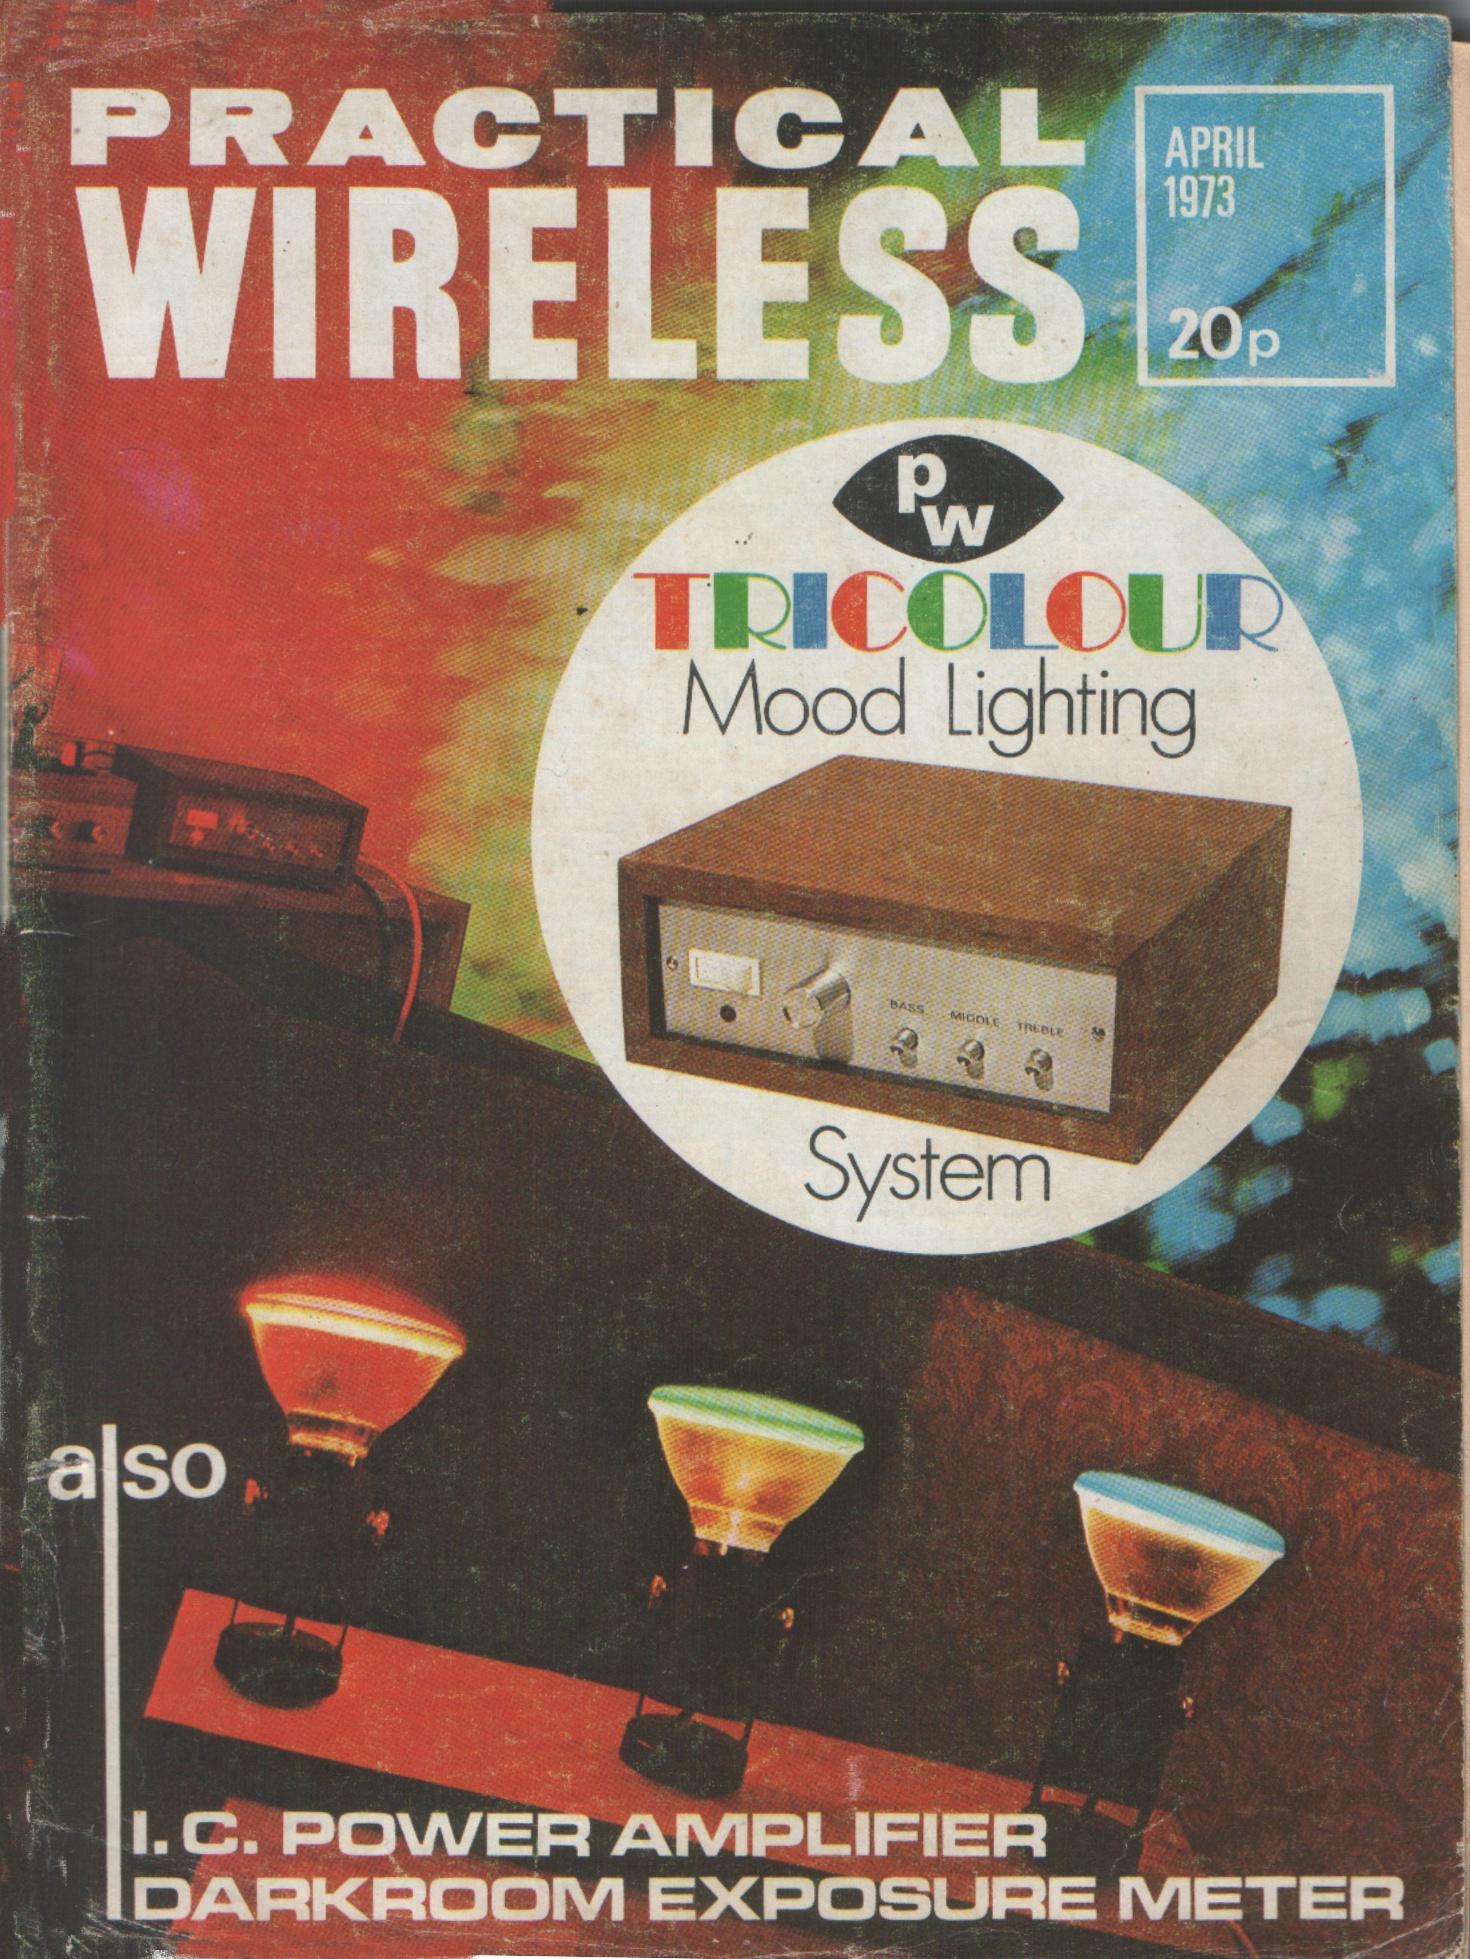 Vintage Radio and Electronics  Magazine Covers 1973